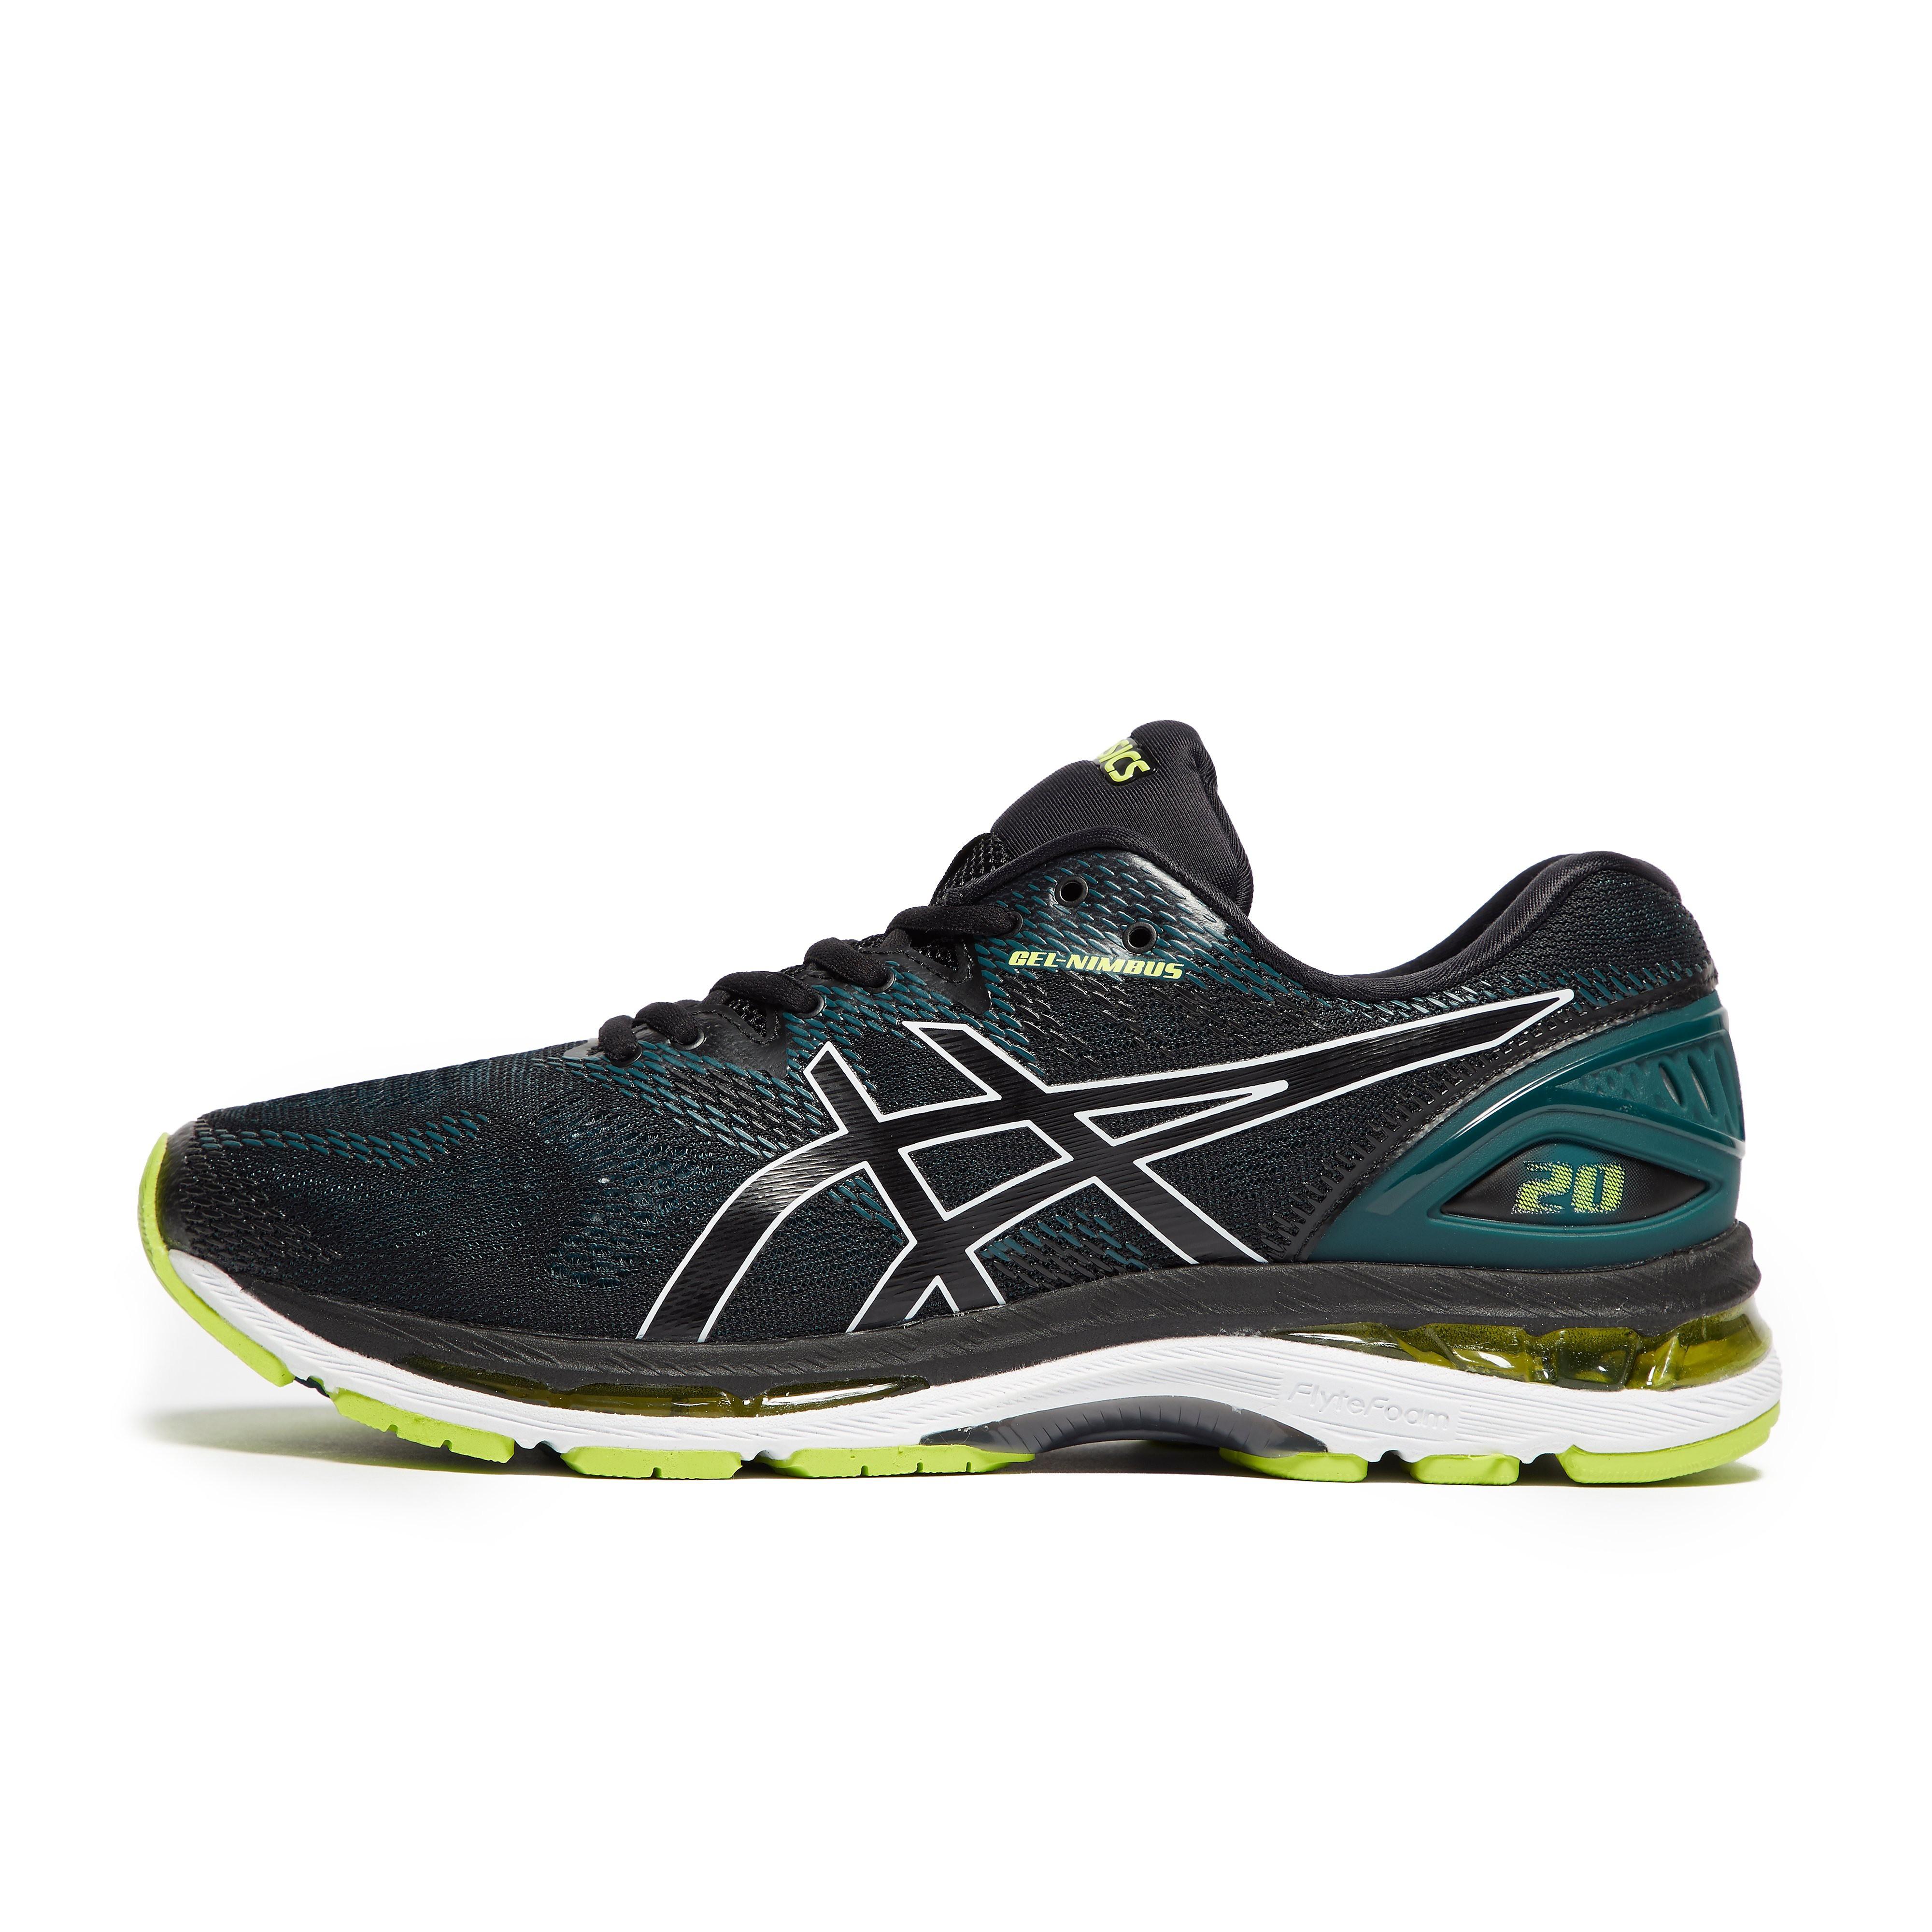 Mens Black ASICS Gel-Nimbus 20 Running Shoes